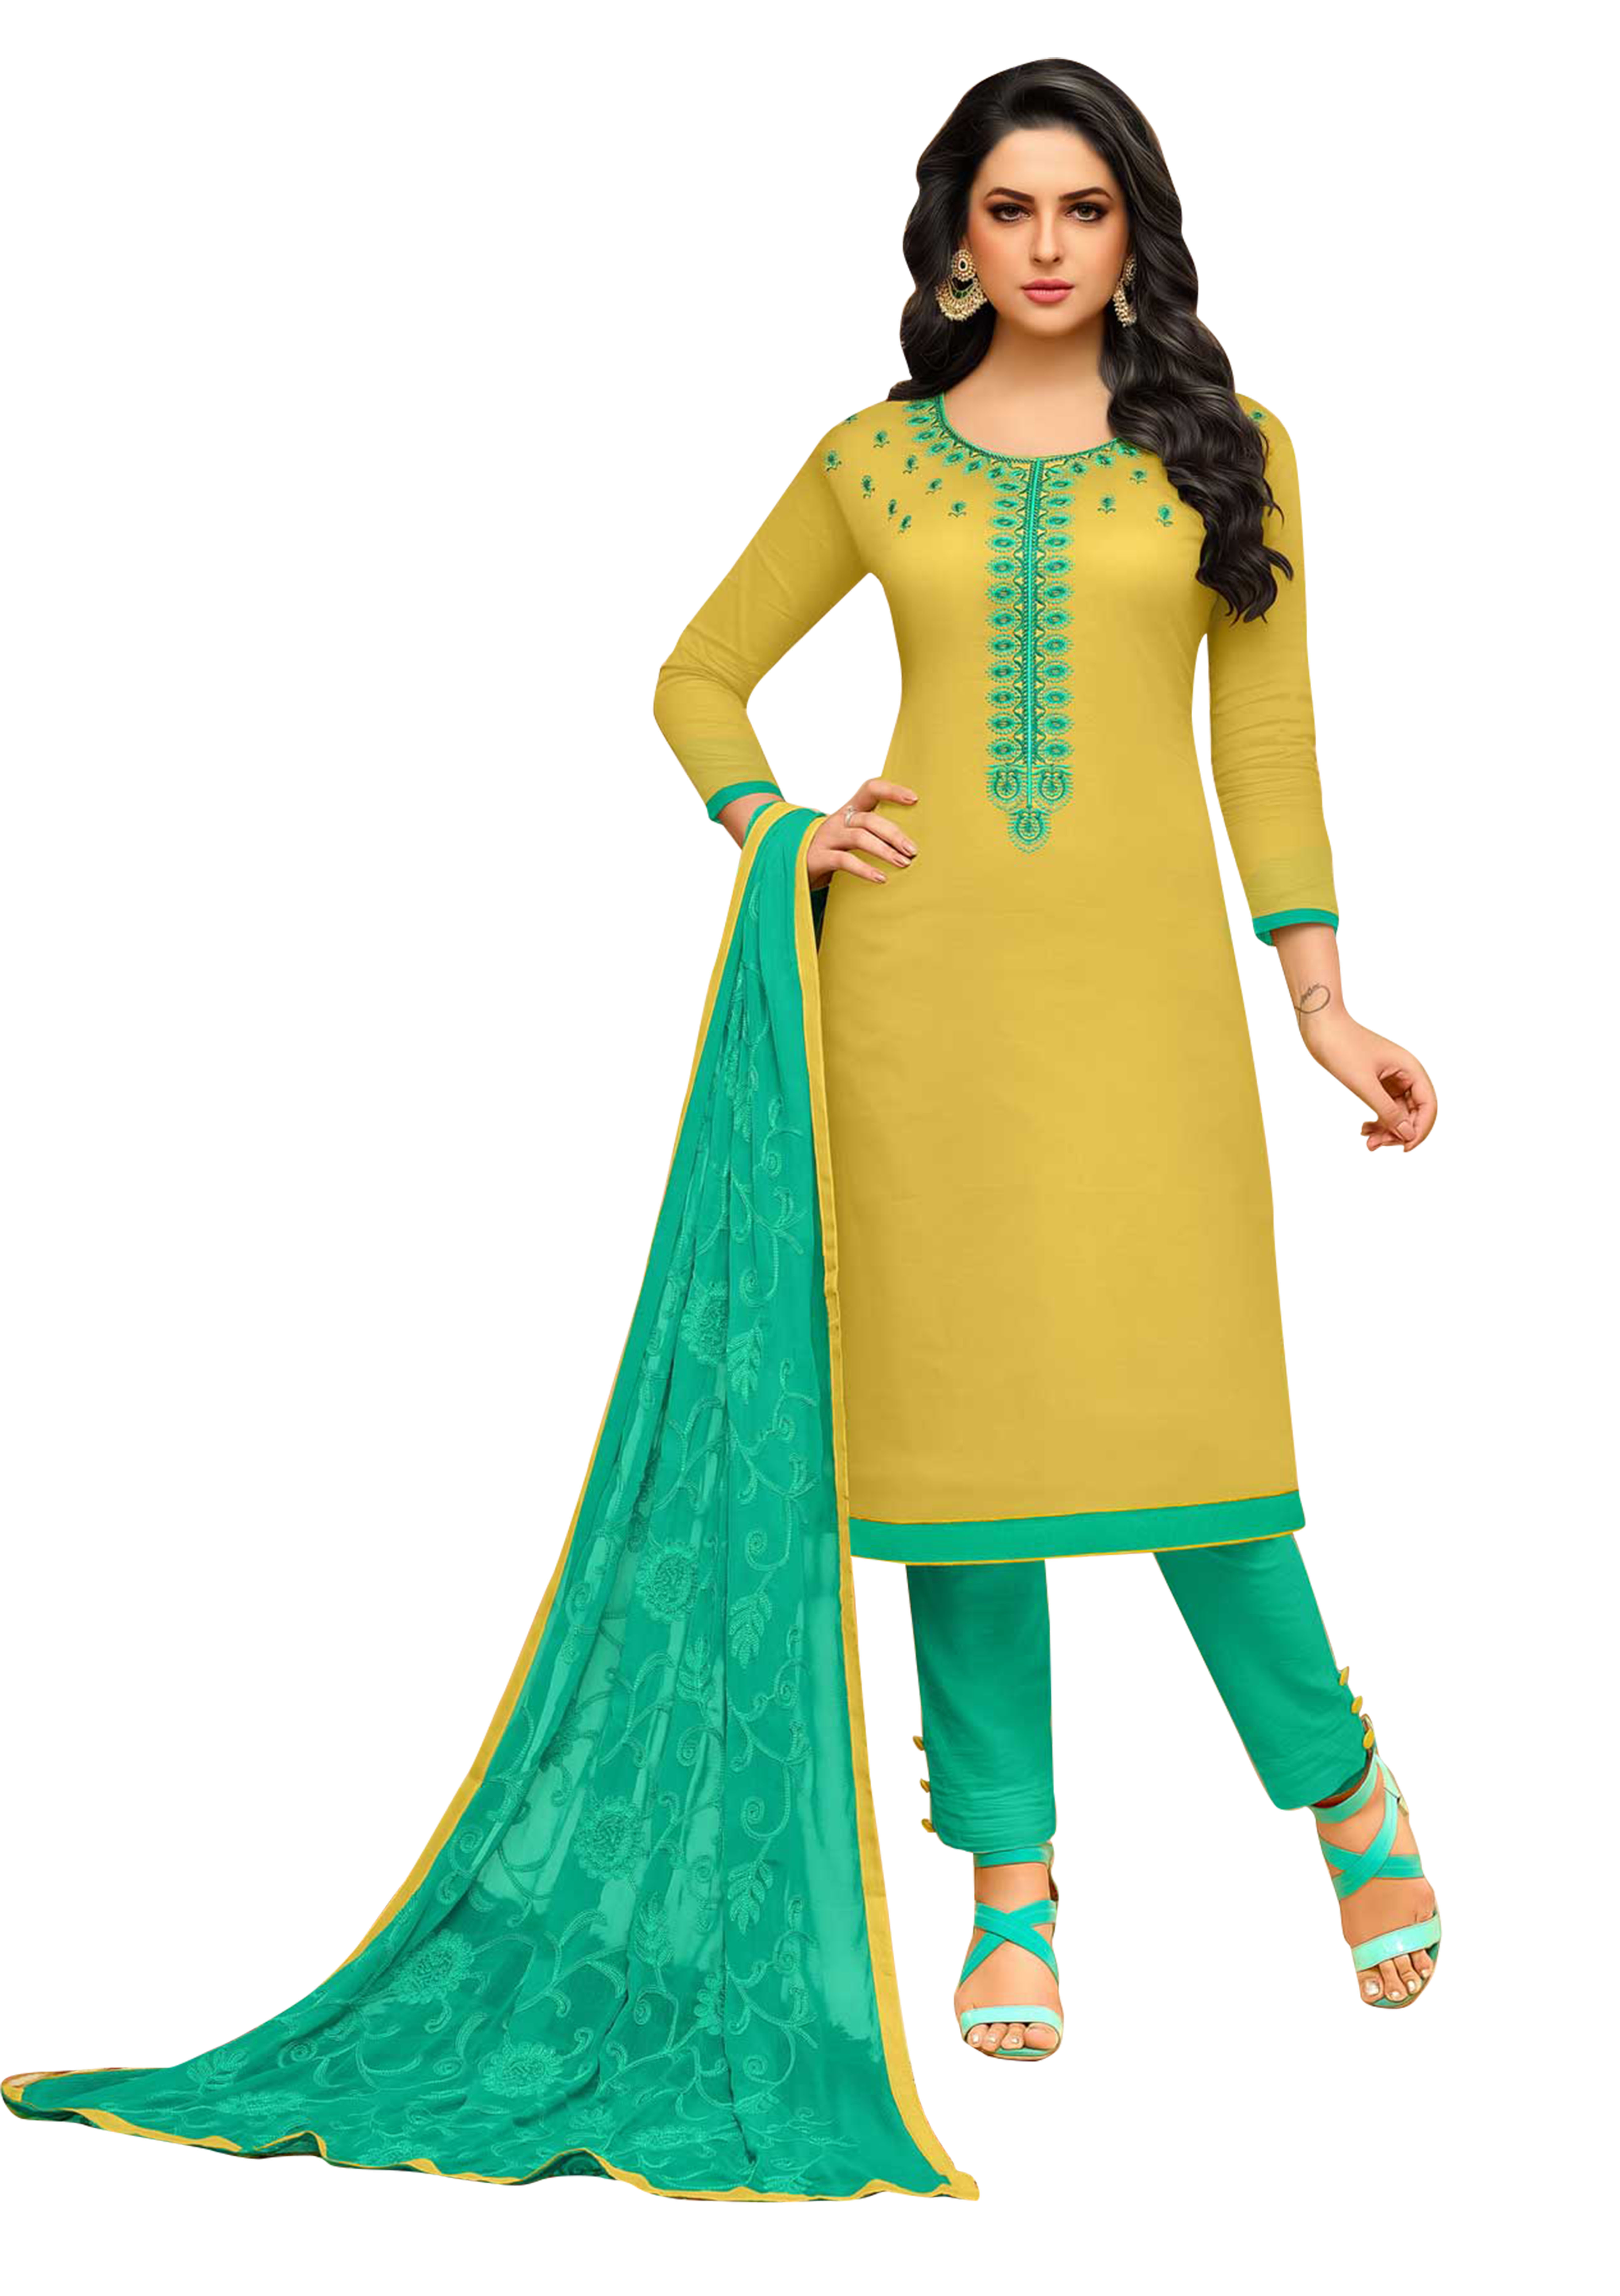 62238ab356 Yellow embroidered cotton salwar - Bansi Sarees - 2520263